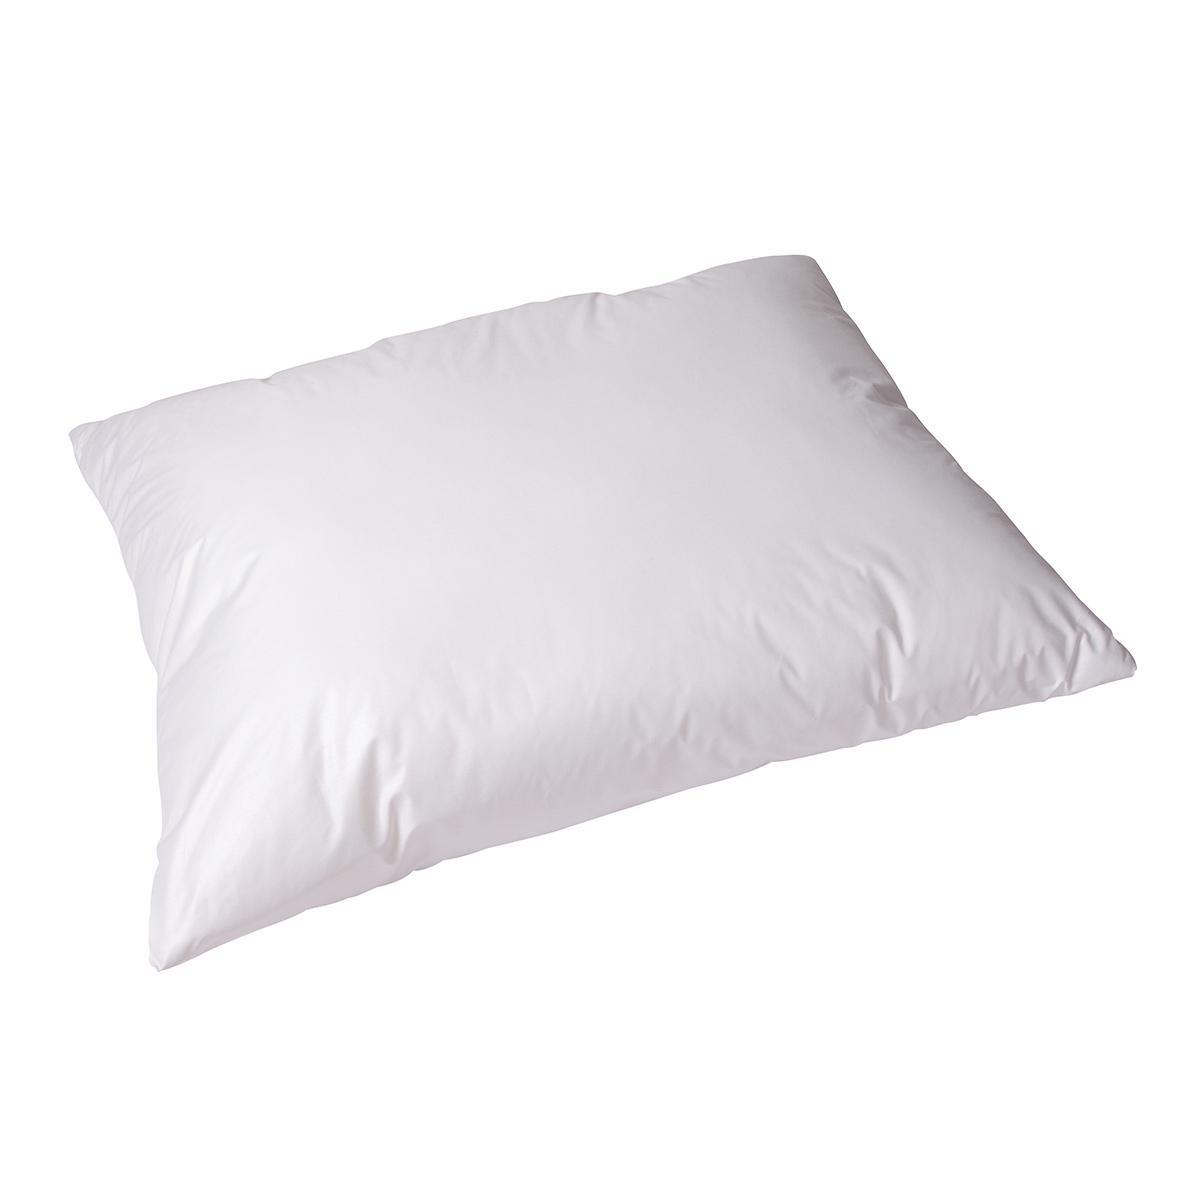 Batex Polštář z dutého vlákna standard, 215 B 90x70 cm, 1 kg